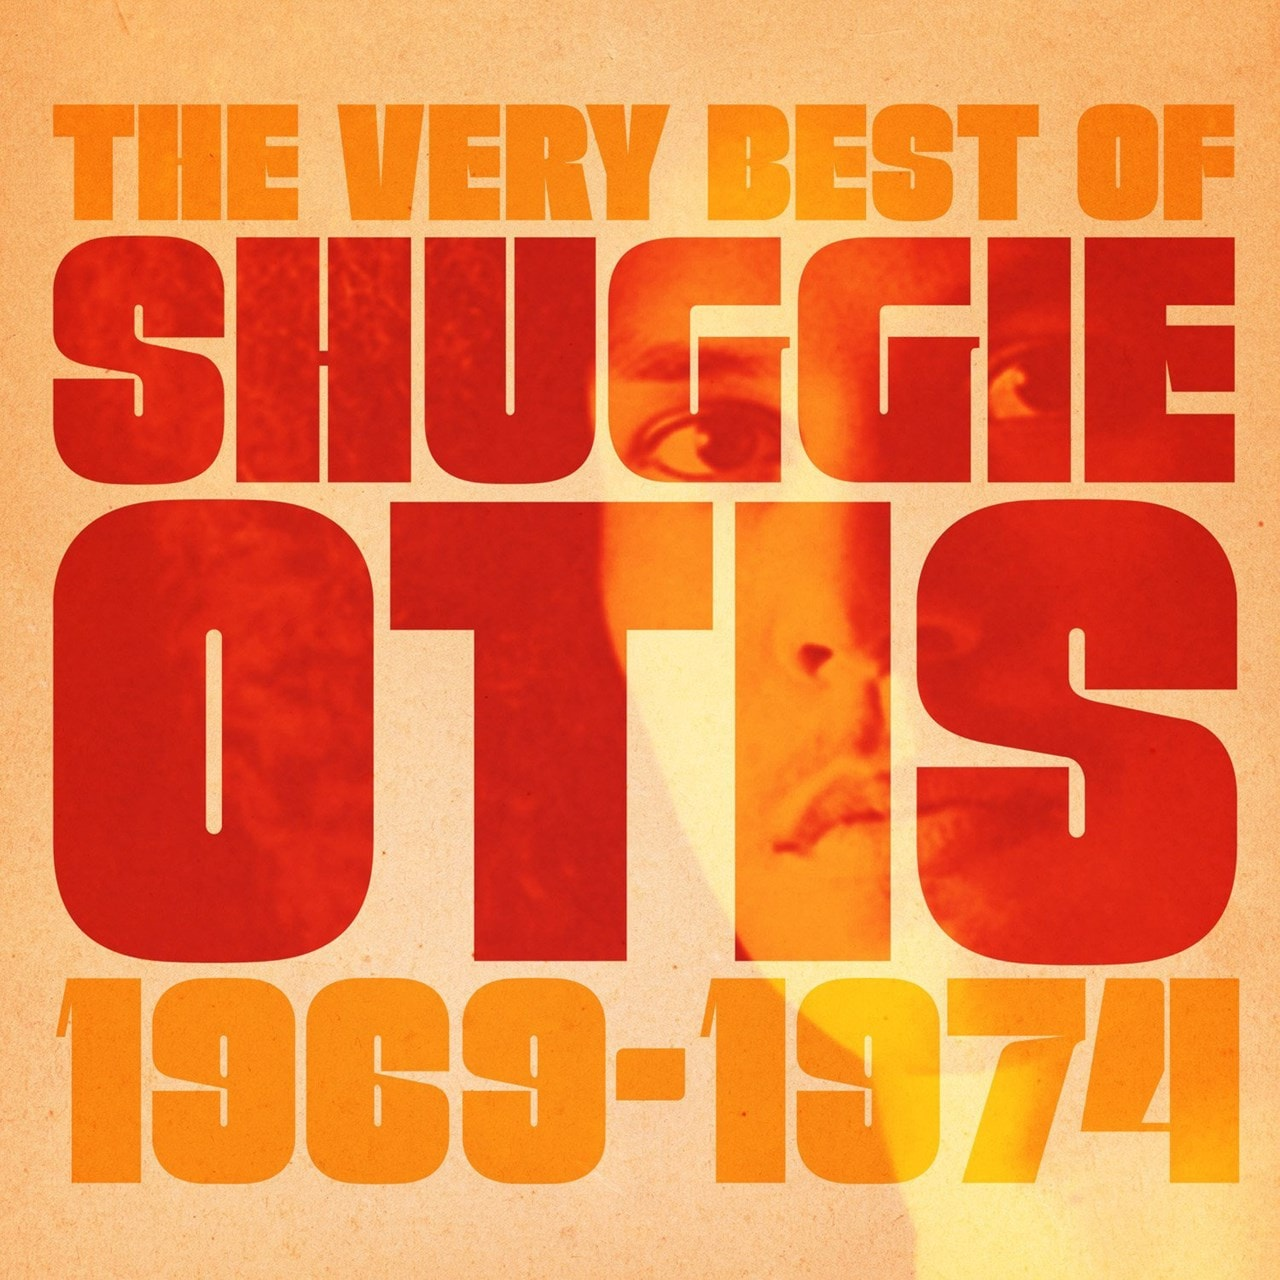 The Very Best of Shuggie Otis: 1969-1974 - 1